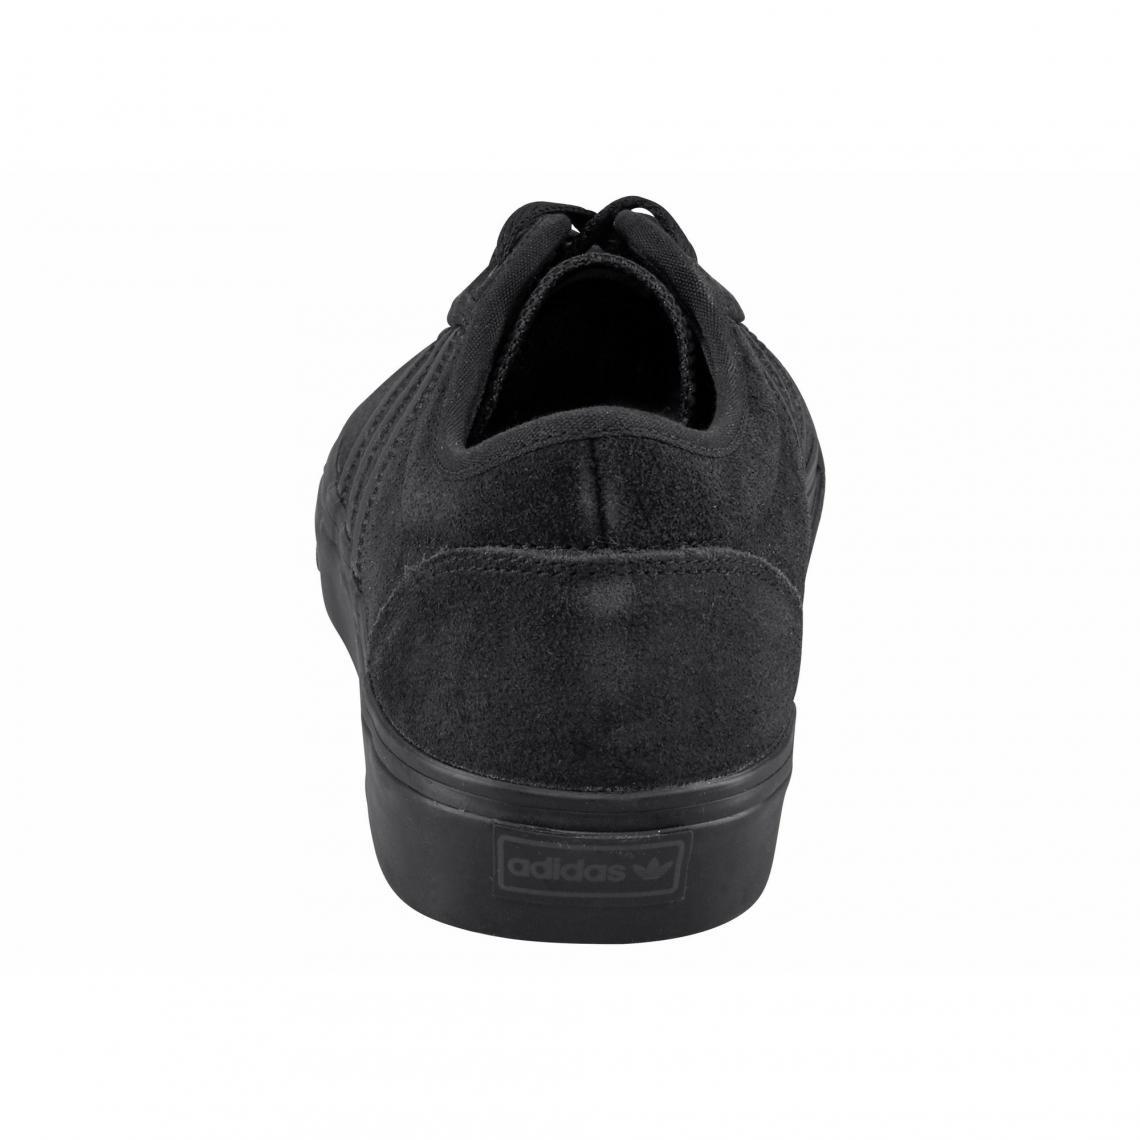 best cheap 96db9 acd7d Toutes les chaussures Adidas Originals